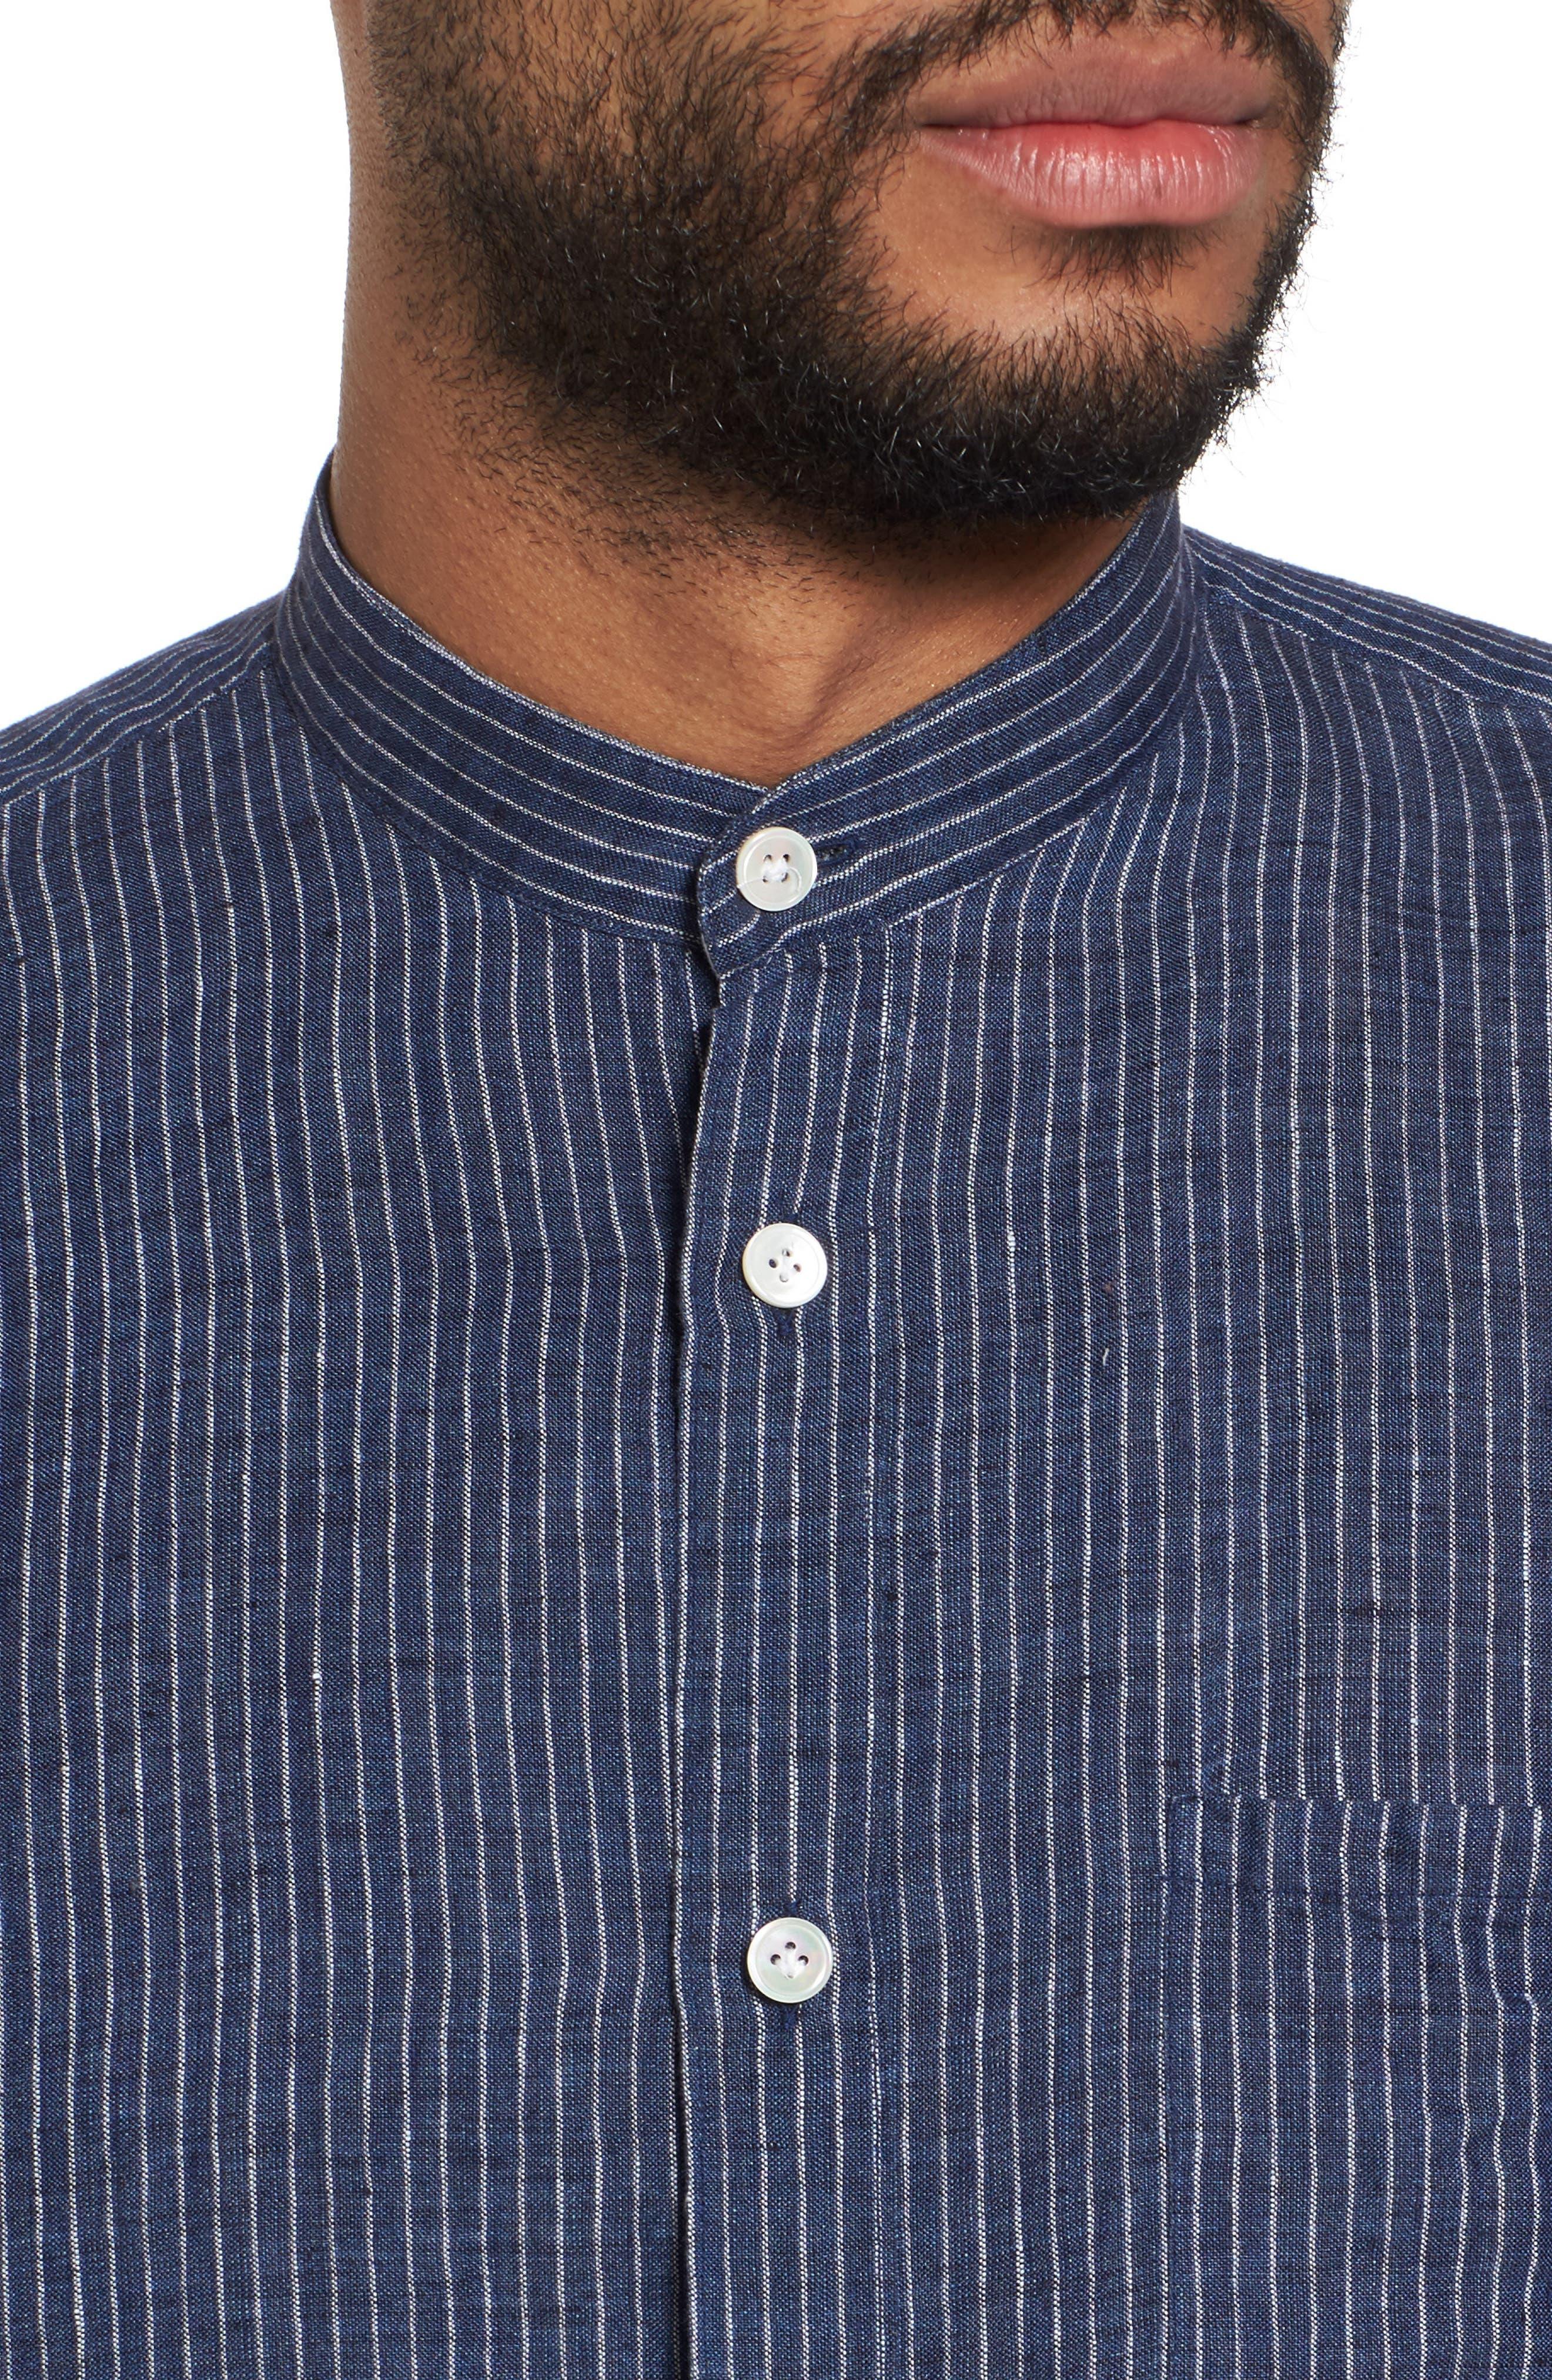 Railroad Stripe Linen Sport Shirt,                             Alternate thumbnail 4, color,                             410